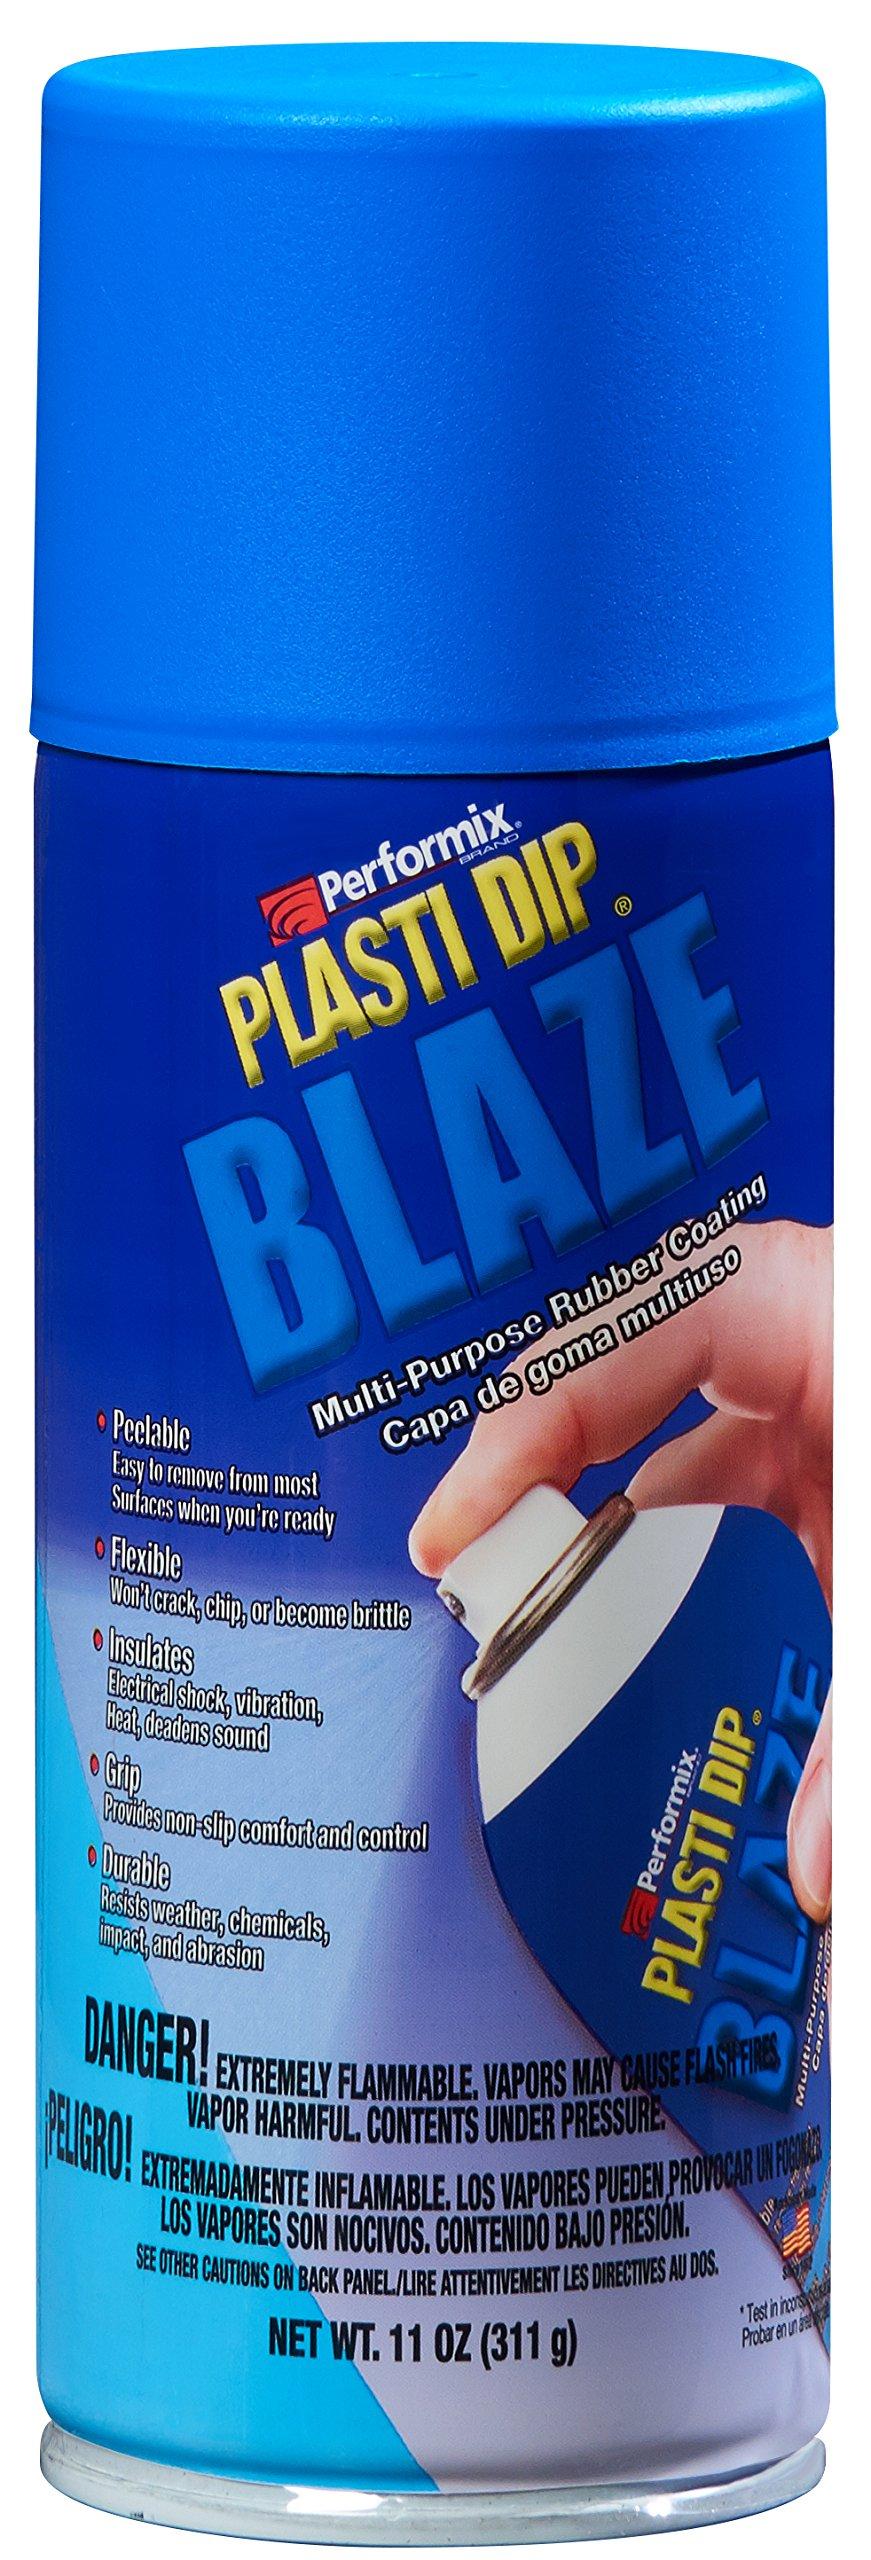 Performix 11219-6PK Plati Dip Spray Blaze Blue, 11. Fluid_Ounces